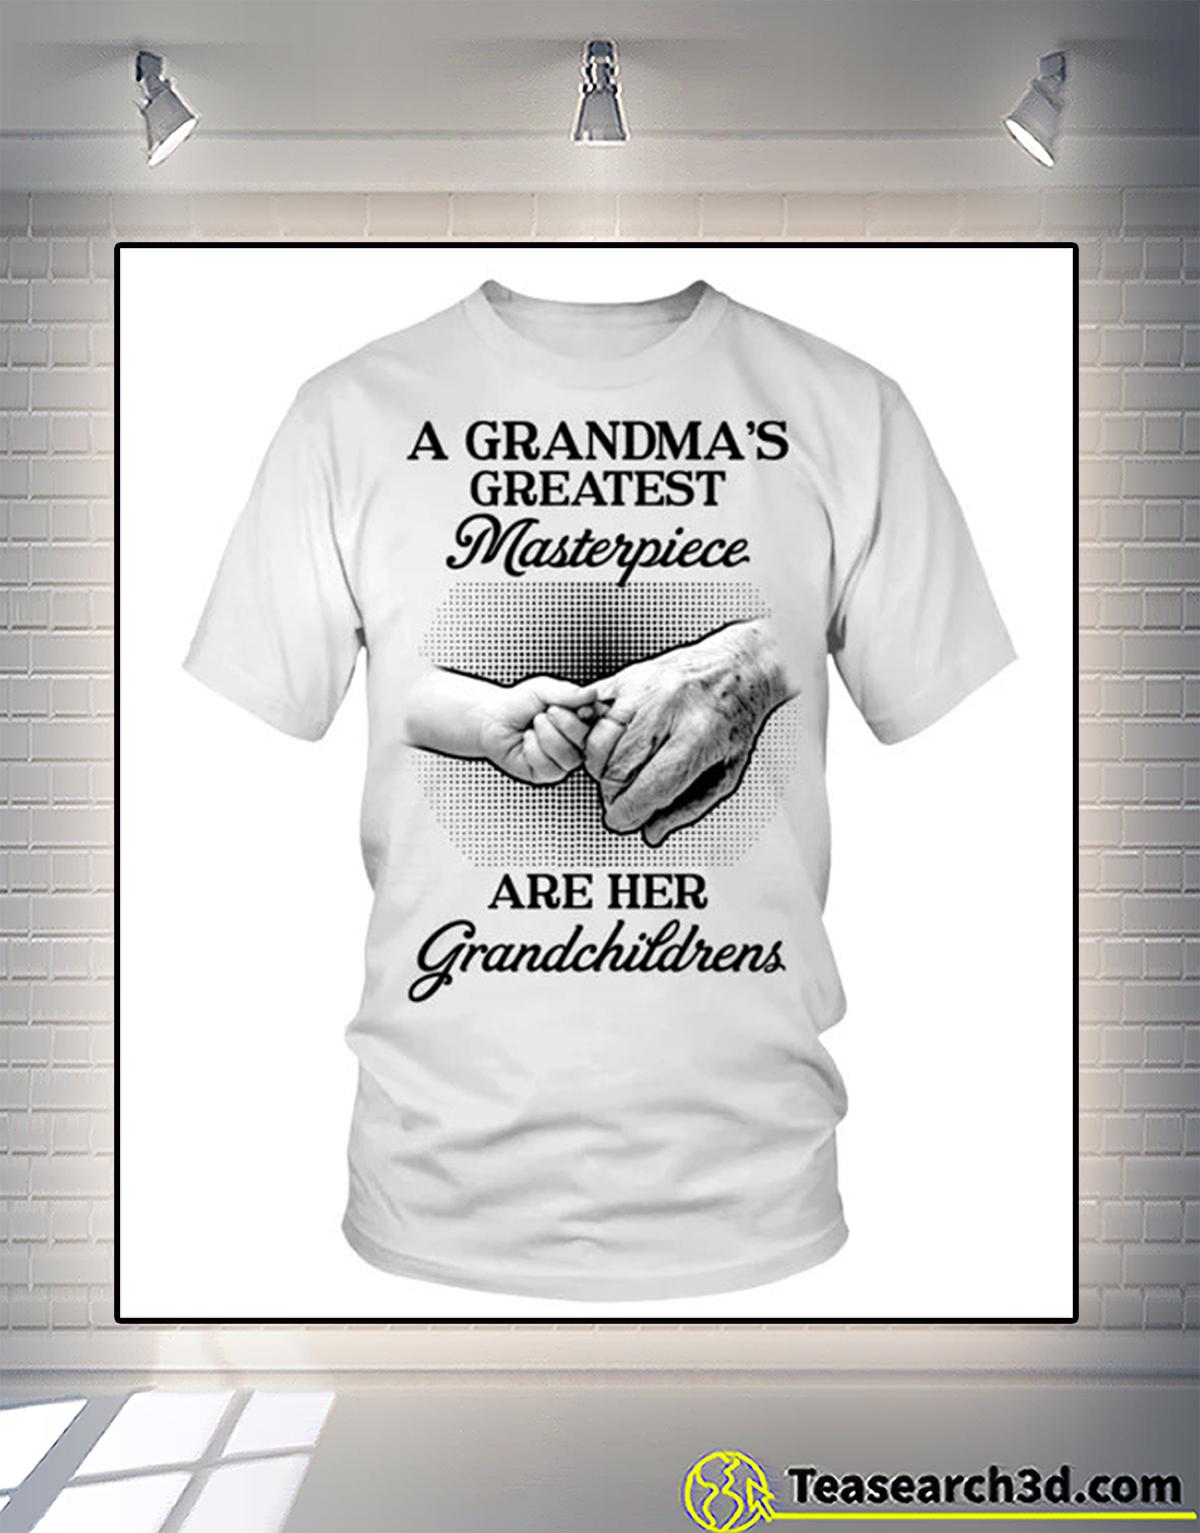 A grandma's greatest masterpiece are her grandchildrens shirt 2